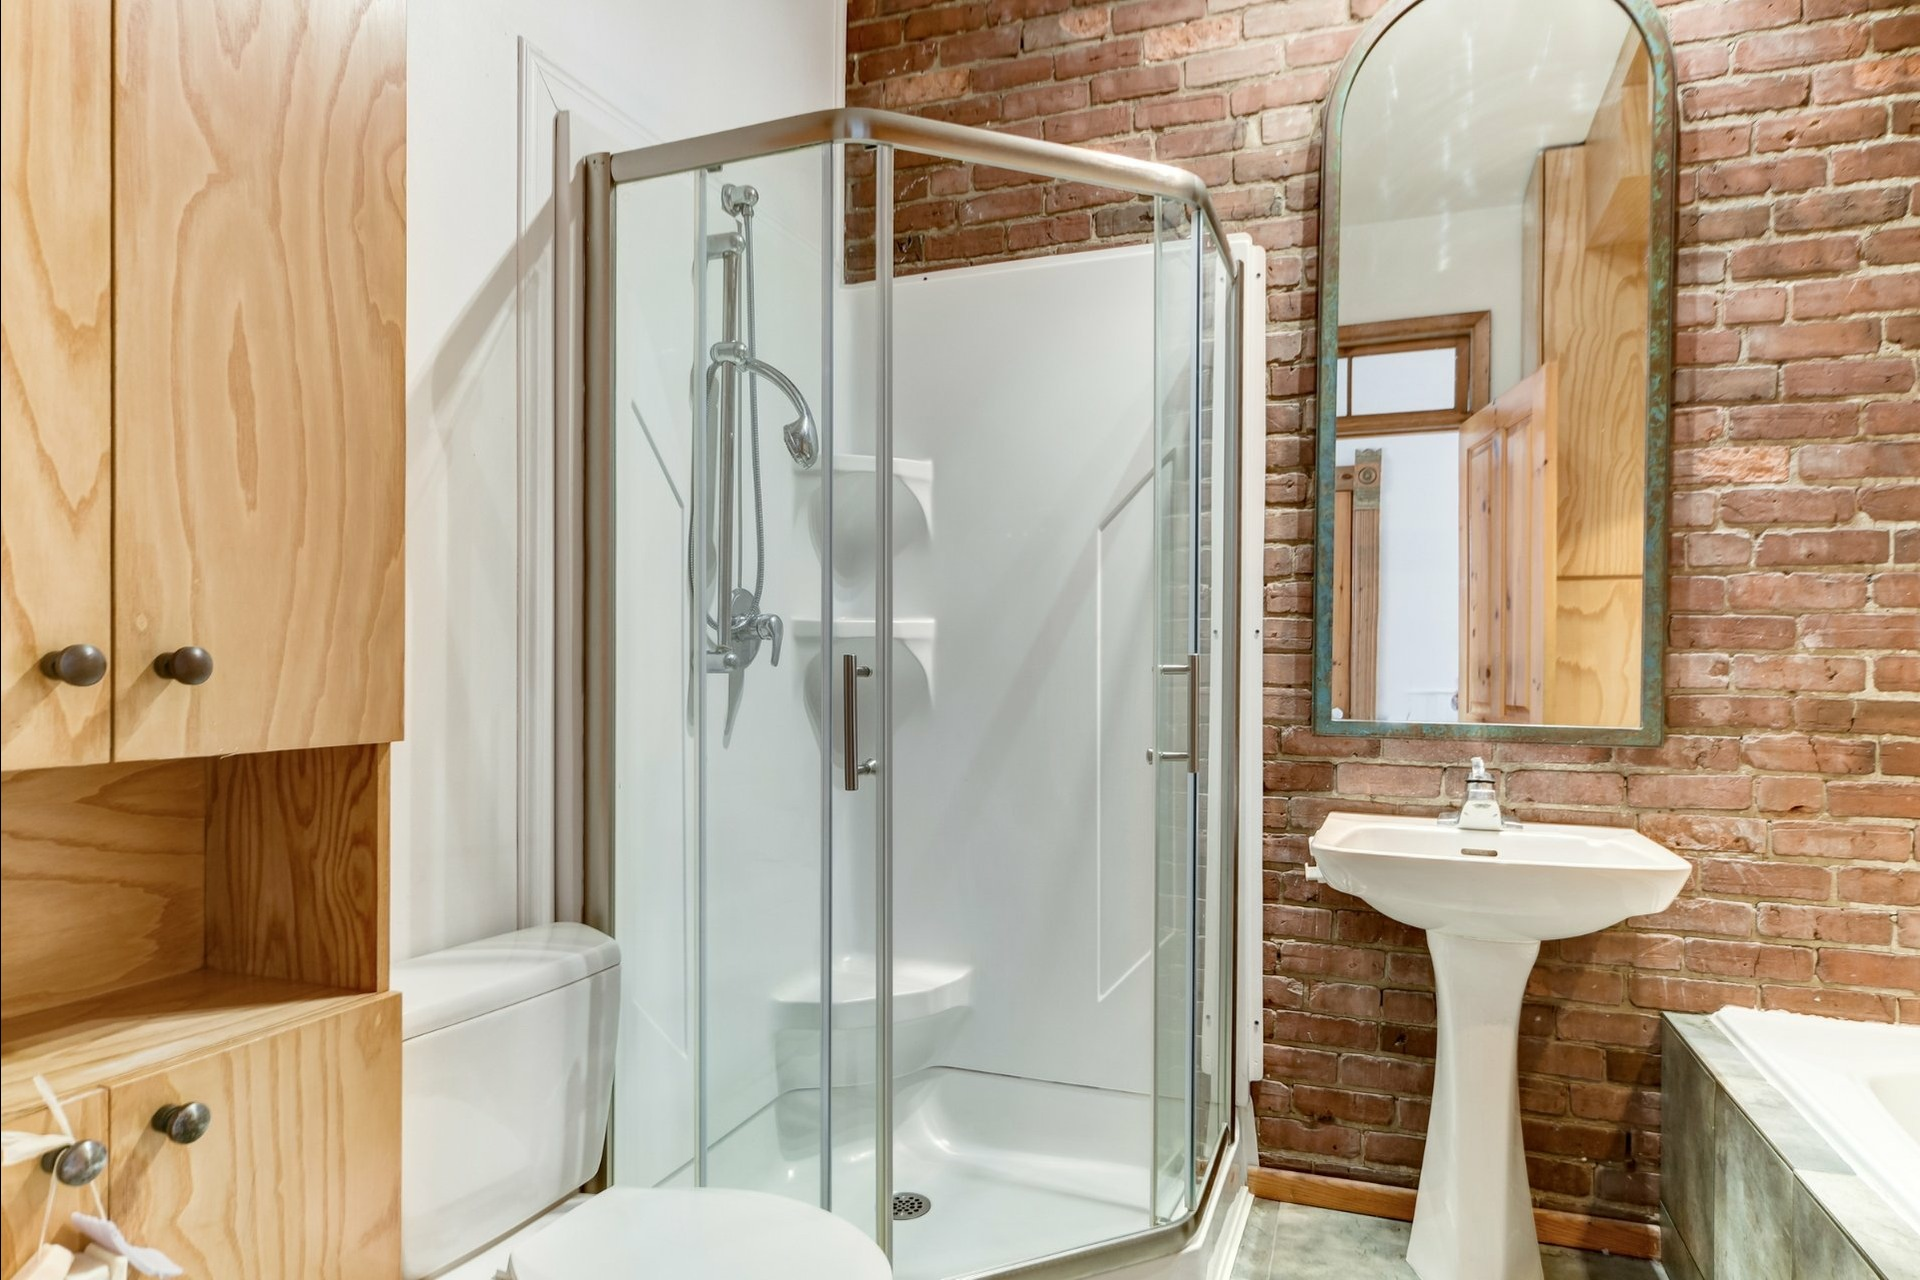 image 18 - Departamento En venta Le Plateau-Mont-Royal Montréal  - 6 habitaciones